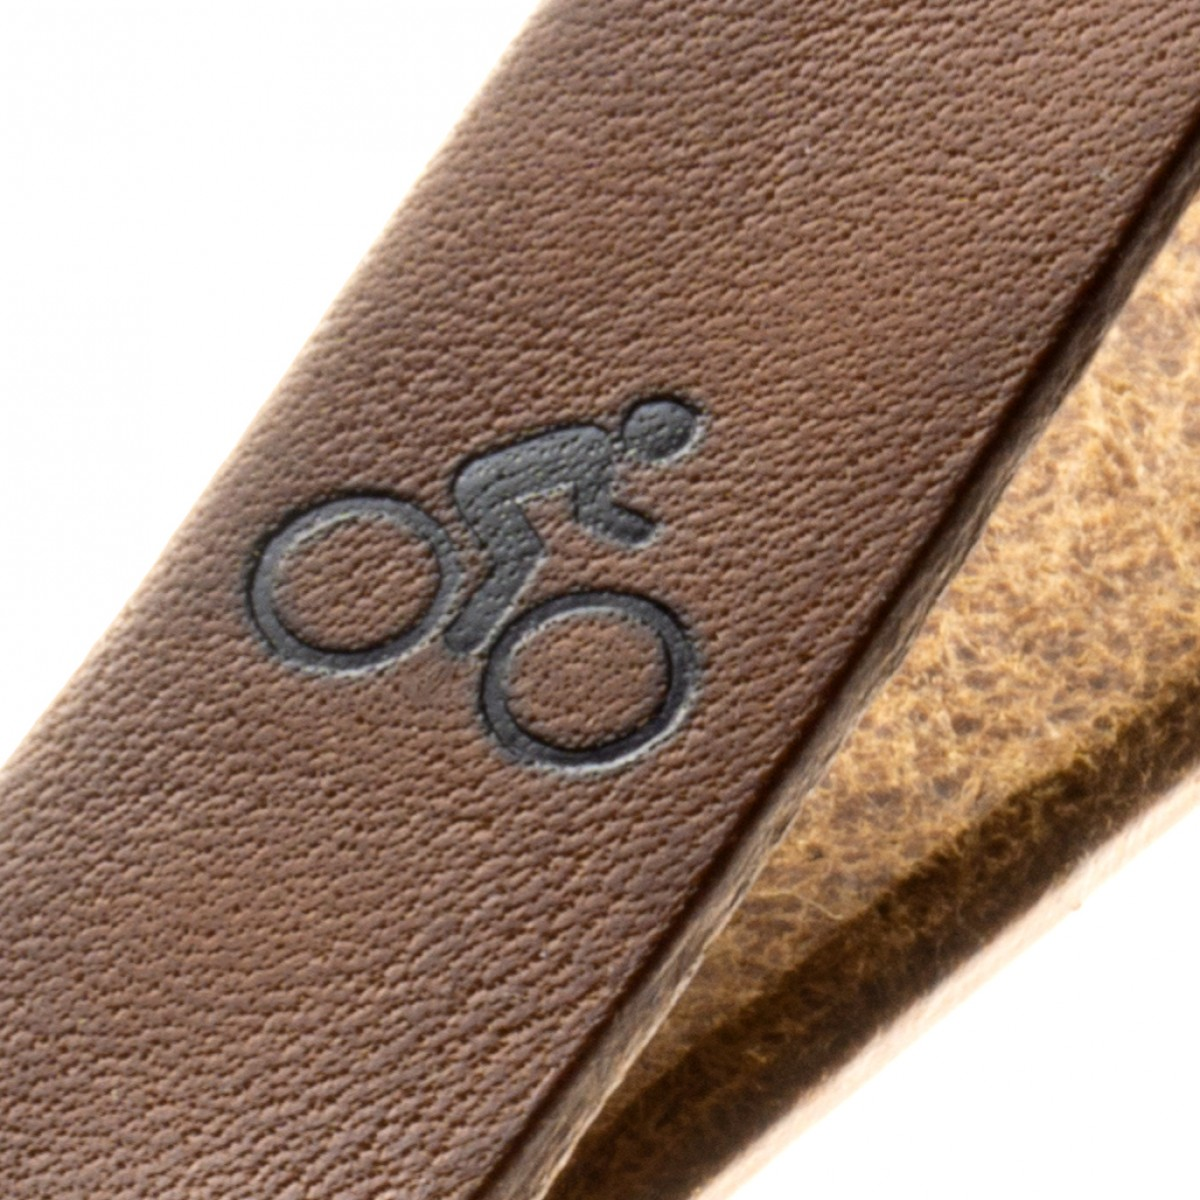 Schlüsselanhänger Fahrradschlüssel pflanzlich gegerbtes Leder Handmade in Germany mit Gravur/Prägung (Fahrrad - Symbol)